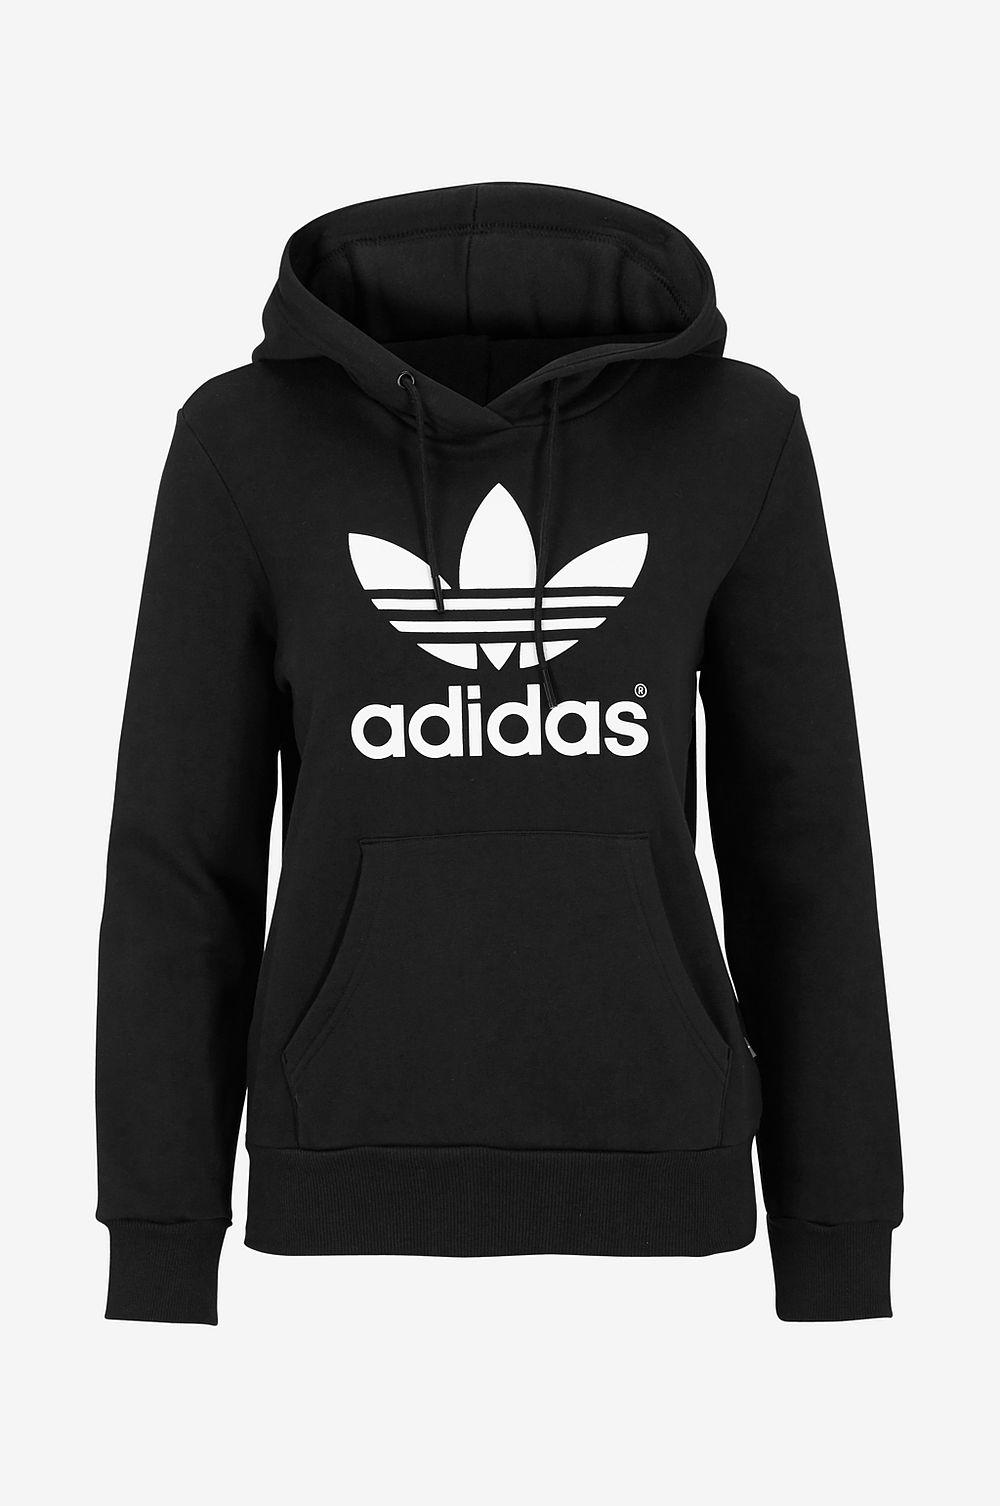 adidas dam hoodie